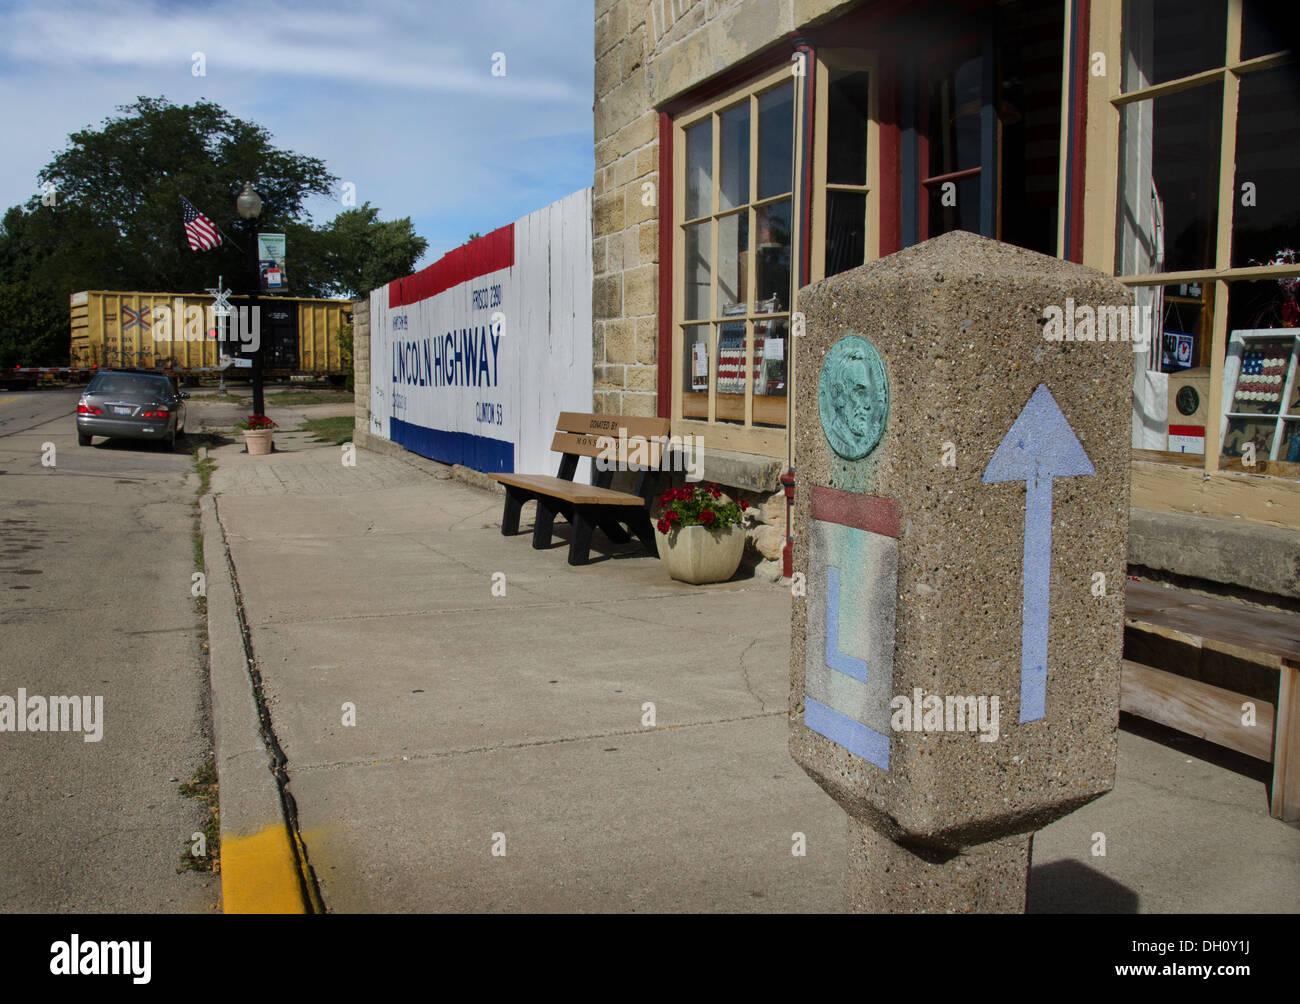 Señales concretas en Lincoln Highway sede Asociación Nacional, Franklin Grove, Illinois Imagen De Stock